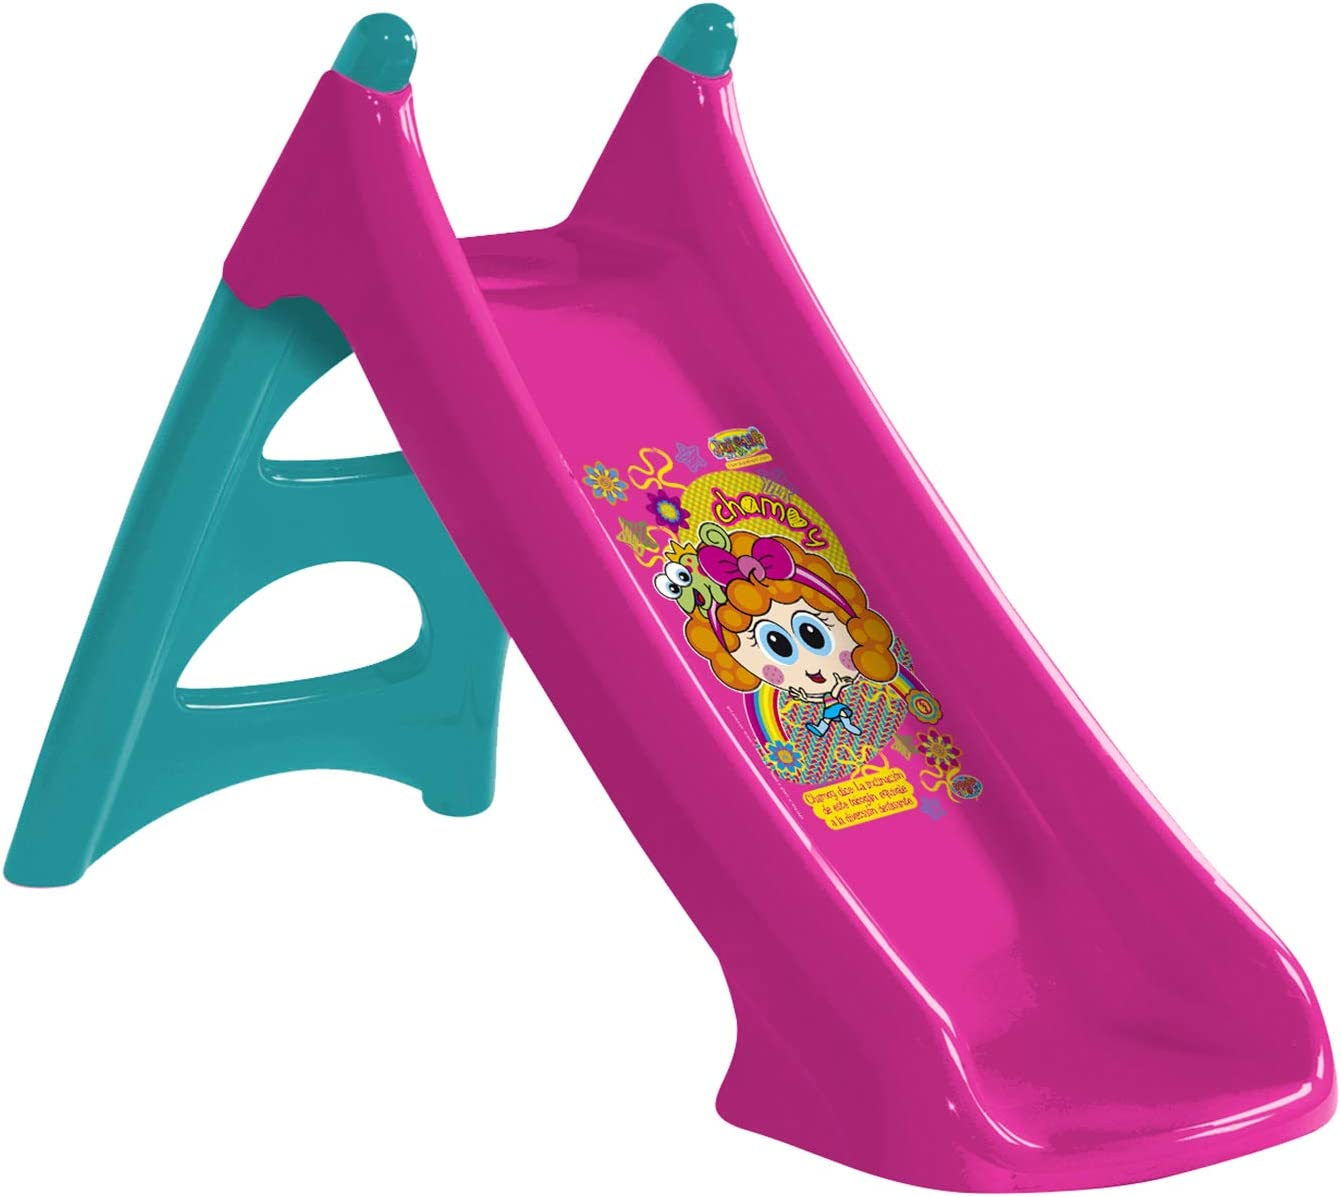 Smoby 820610 Slide Pink